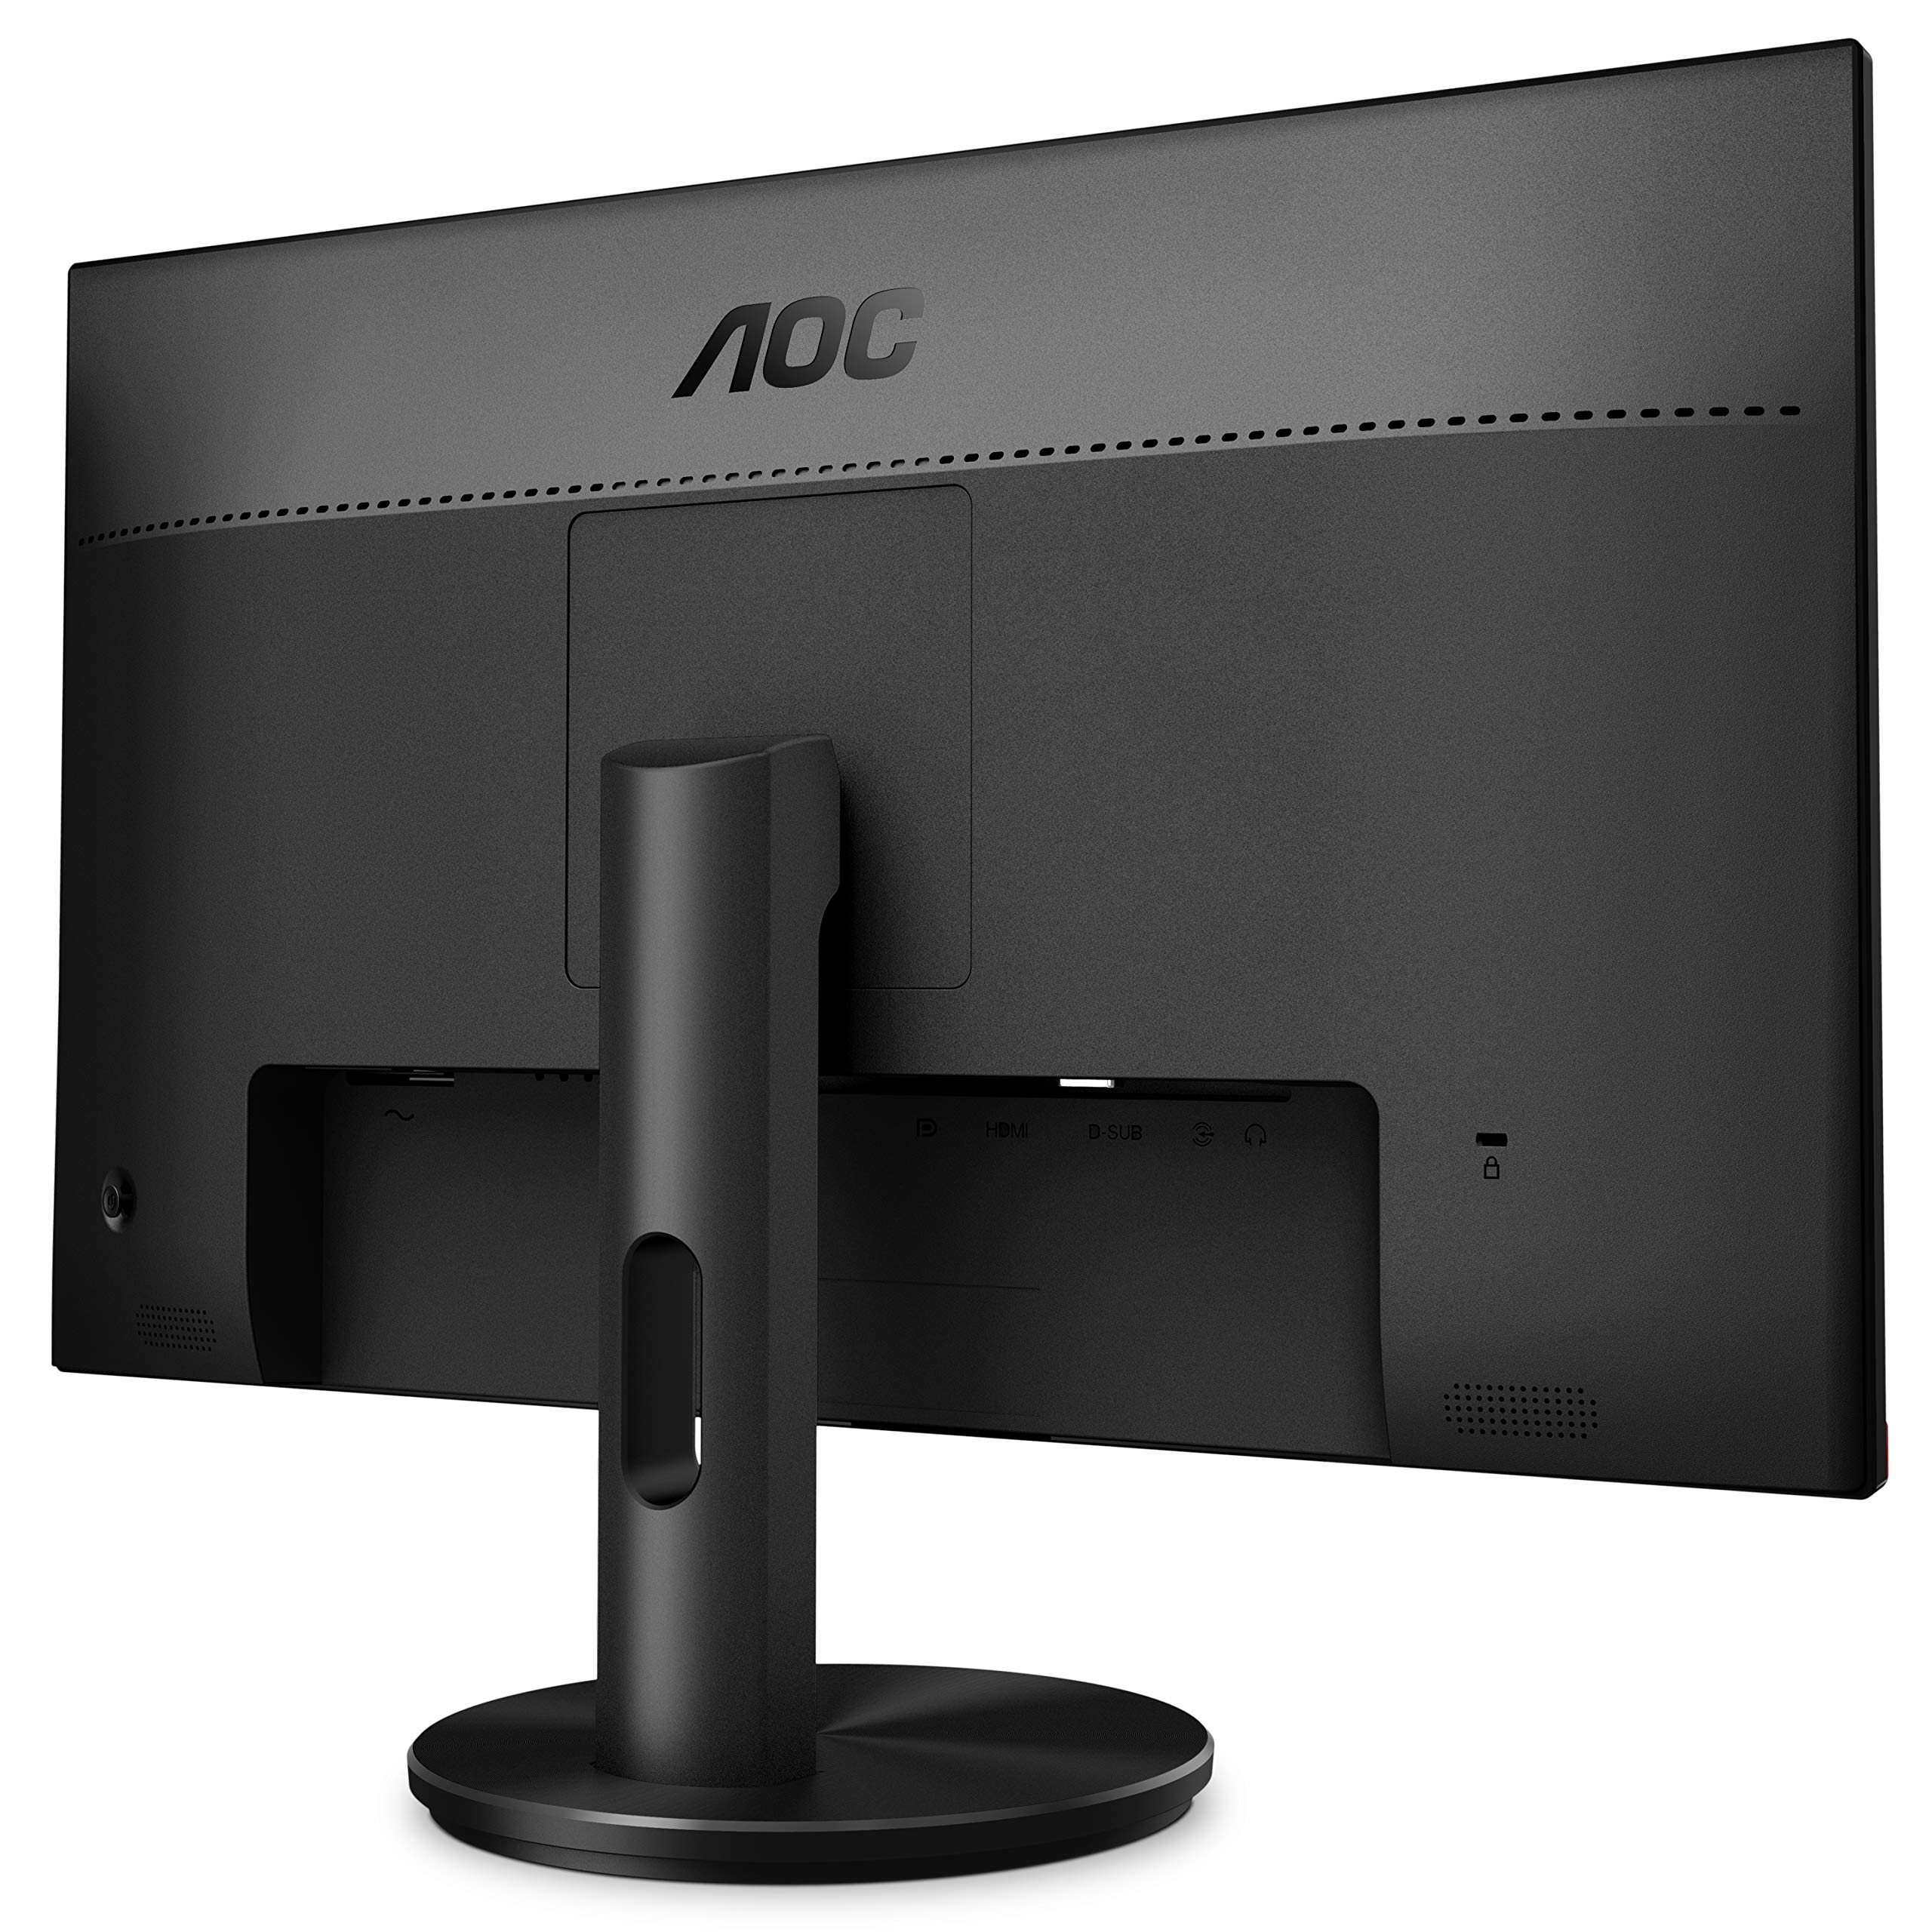 AOC G2590FX 25'' Framless Gaming Monitor, FHD 1920x1080, 1ms, 144Hz, G-SYNC Compatible+AdaptiveSync, 96% sRGB, DisplayPort/HDMI/VGA, VESA, 25 inch, Black / Red by AOC (Image #2)